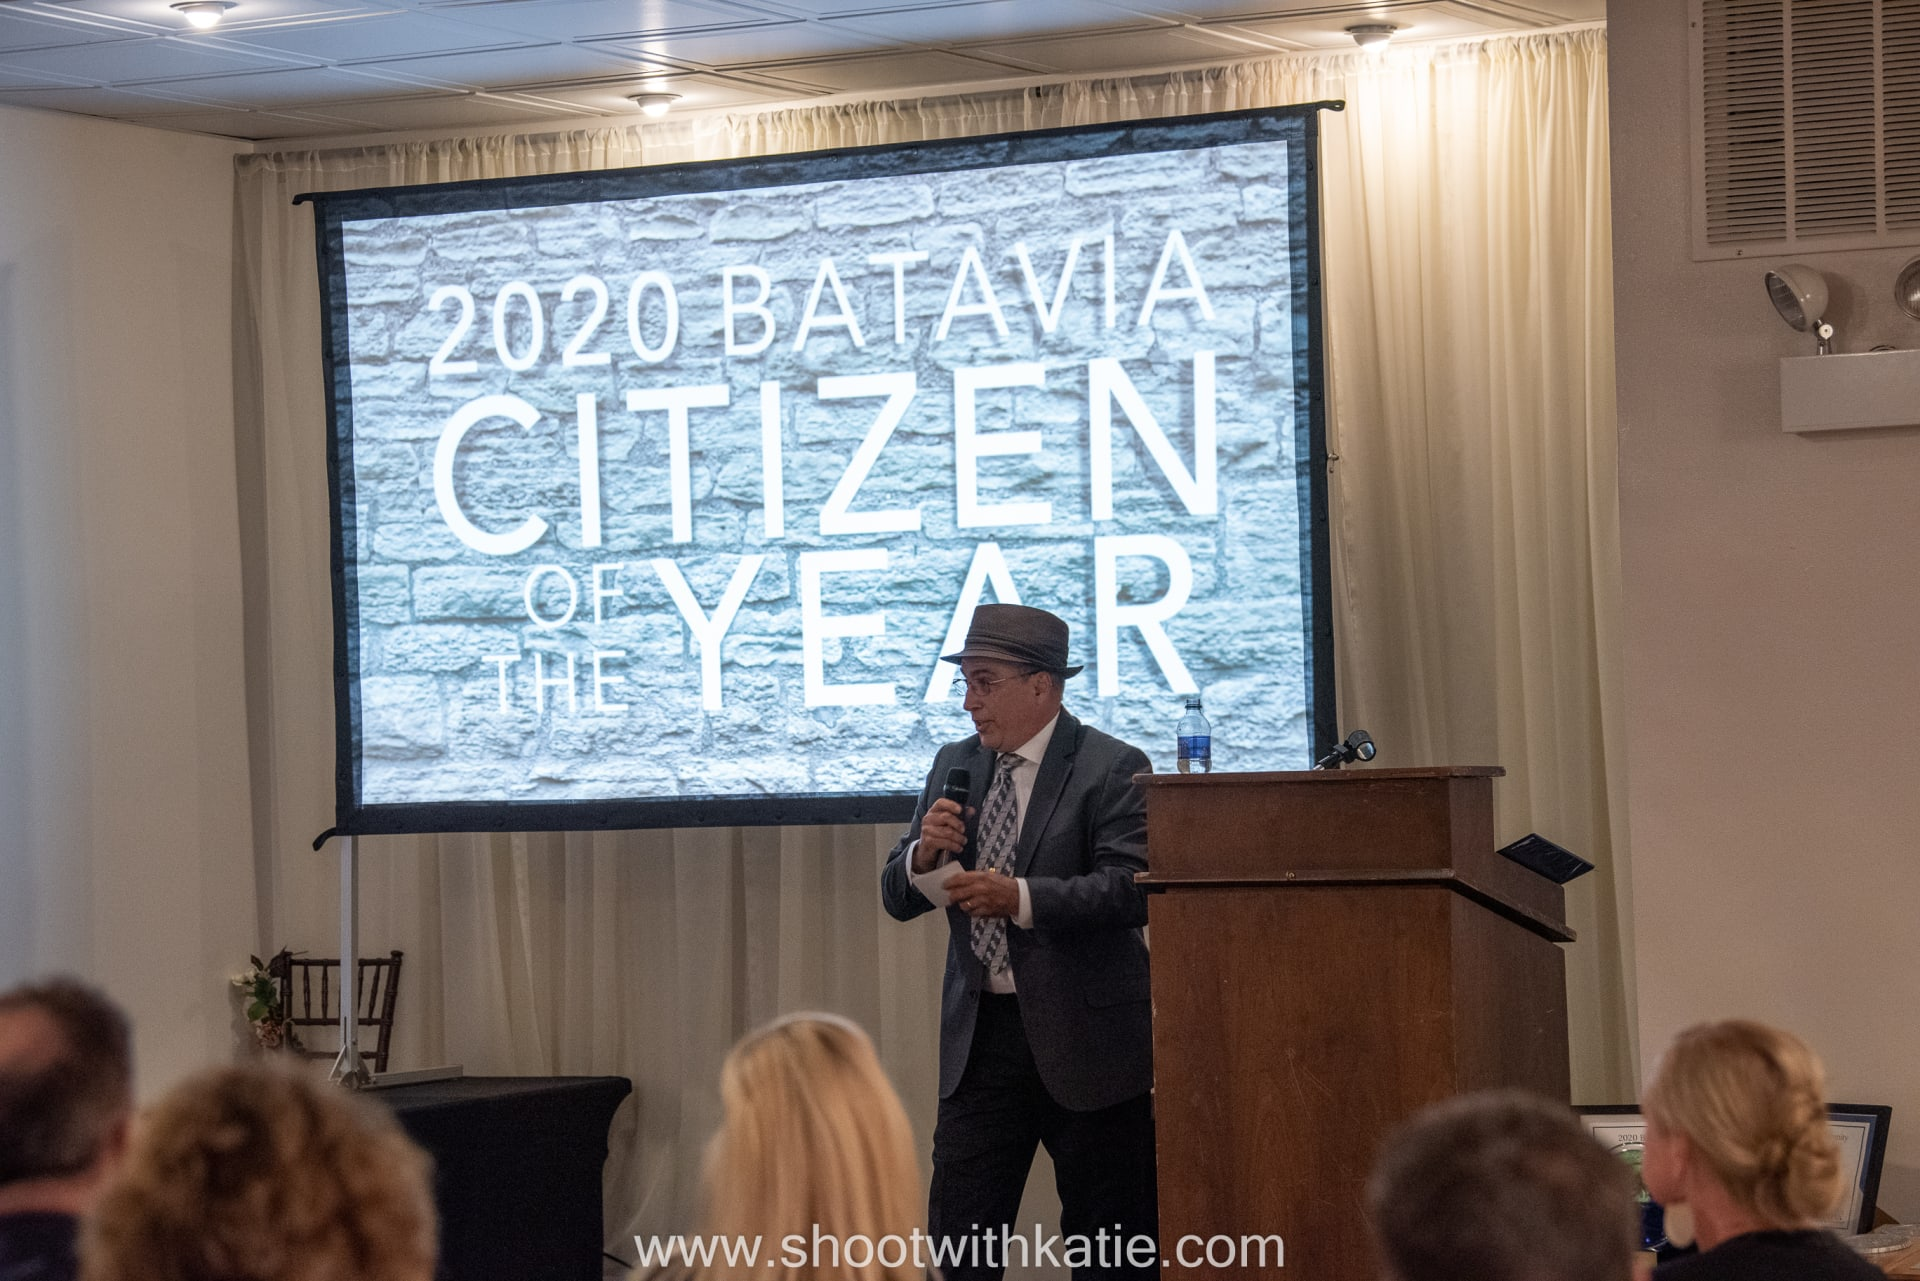 Bob-Hansen-Citizen-of-the-Year-w1920.jpg